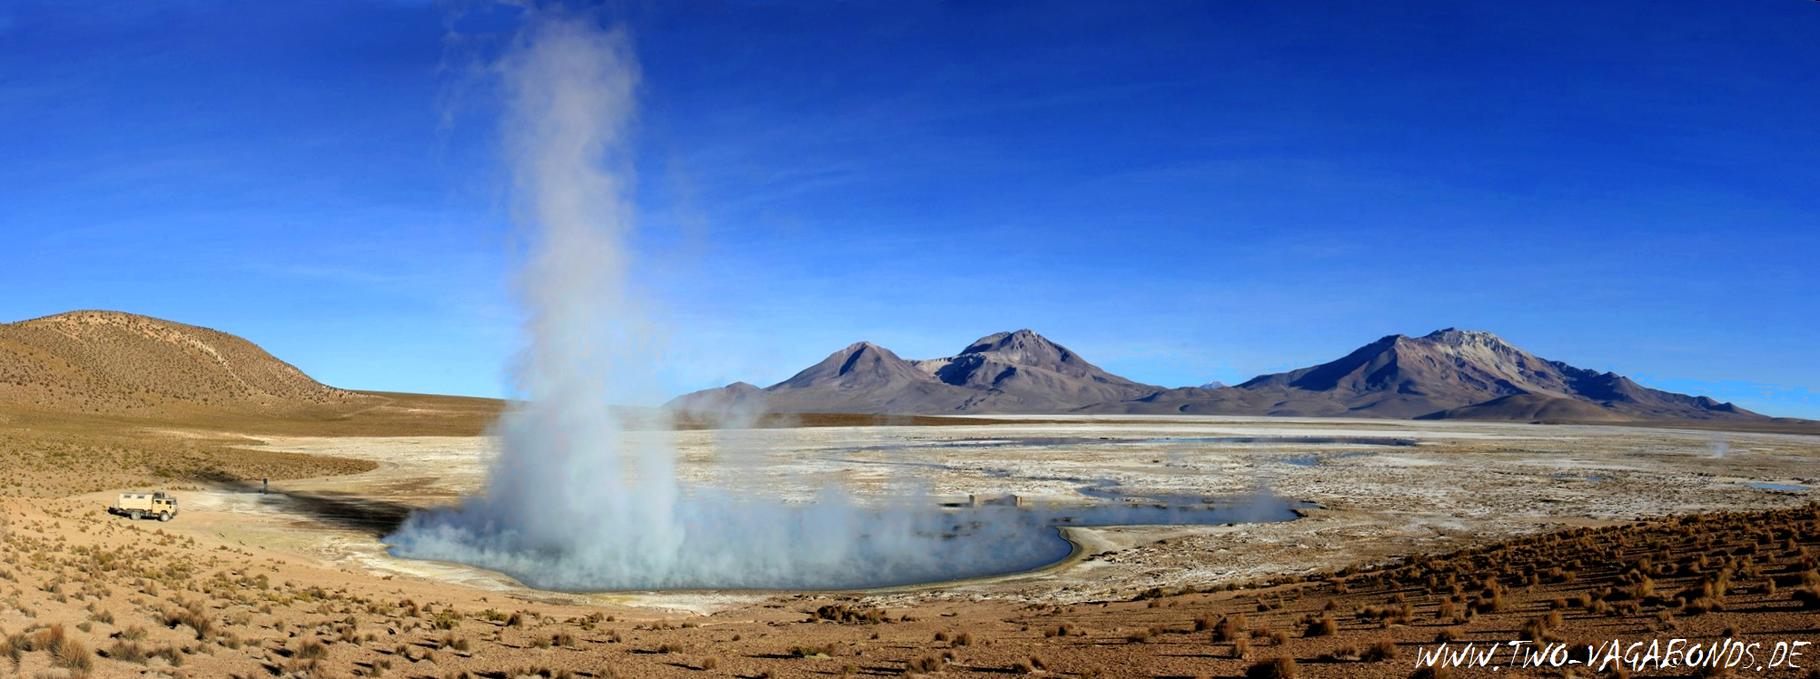 CHILE 2015 - SALAR SURIRE - THERME POLOQUERE - 4300 m HÖHE